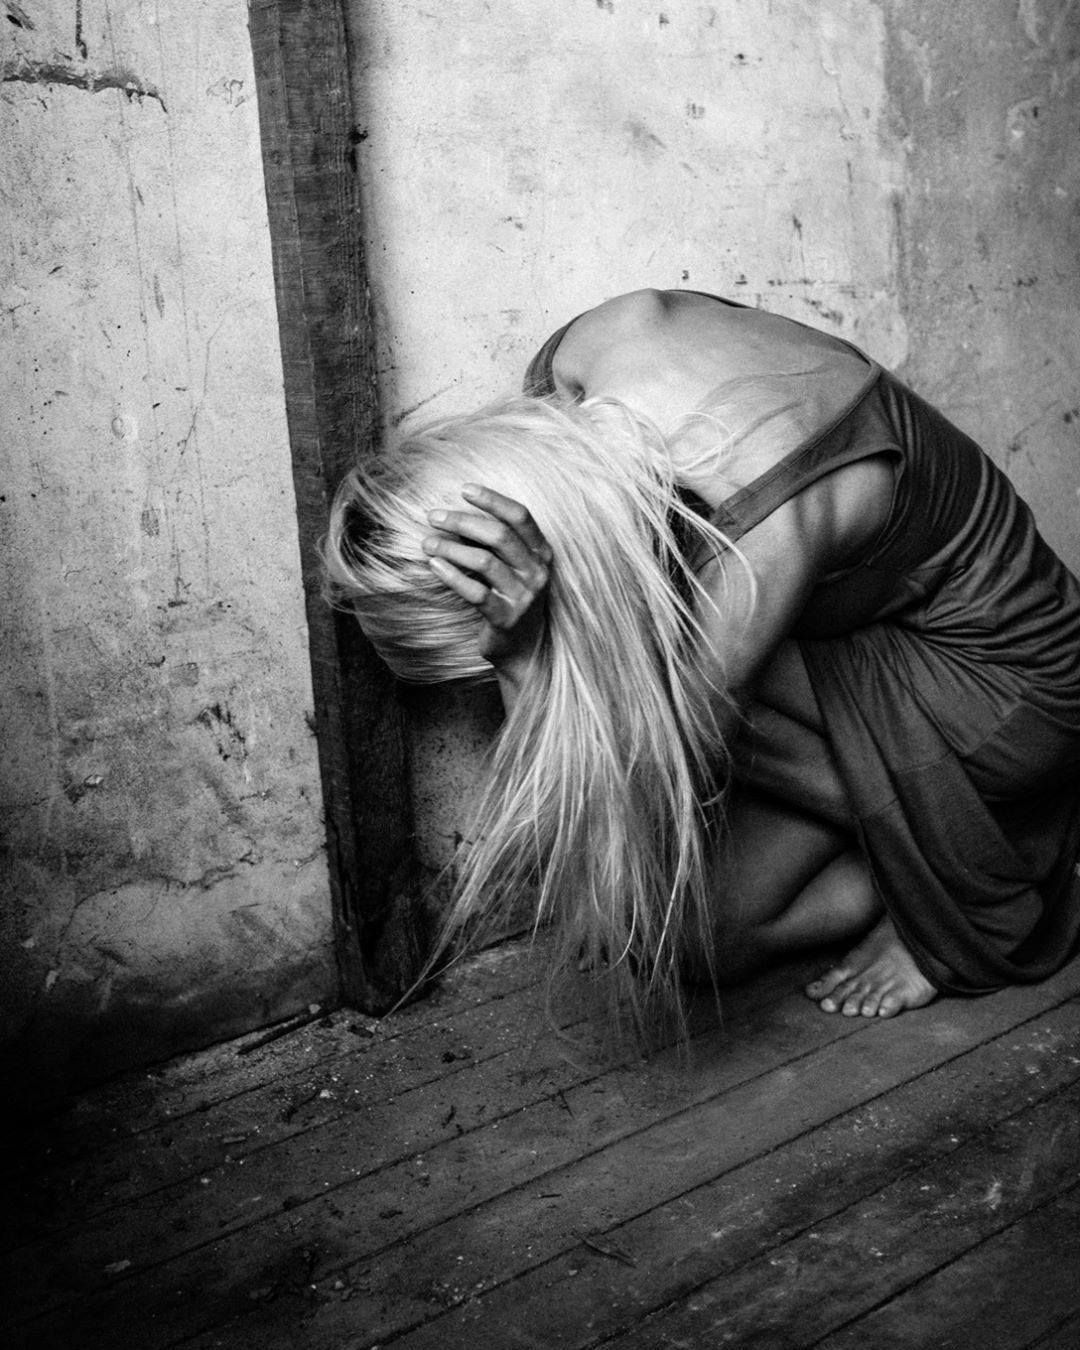 Dark soul @dafnevanderboon #art #woman #modelphotography # ...